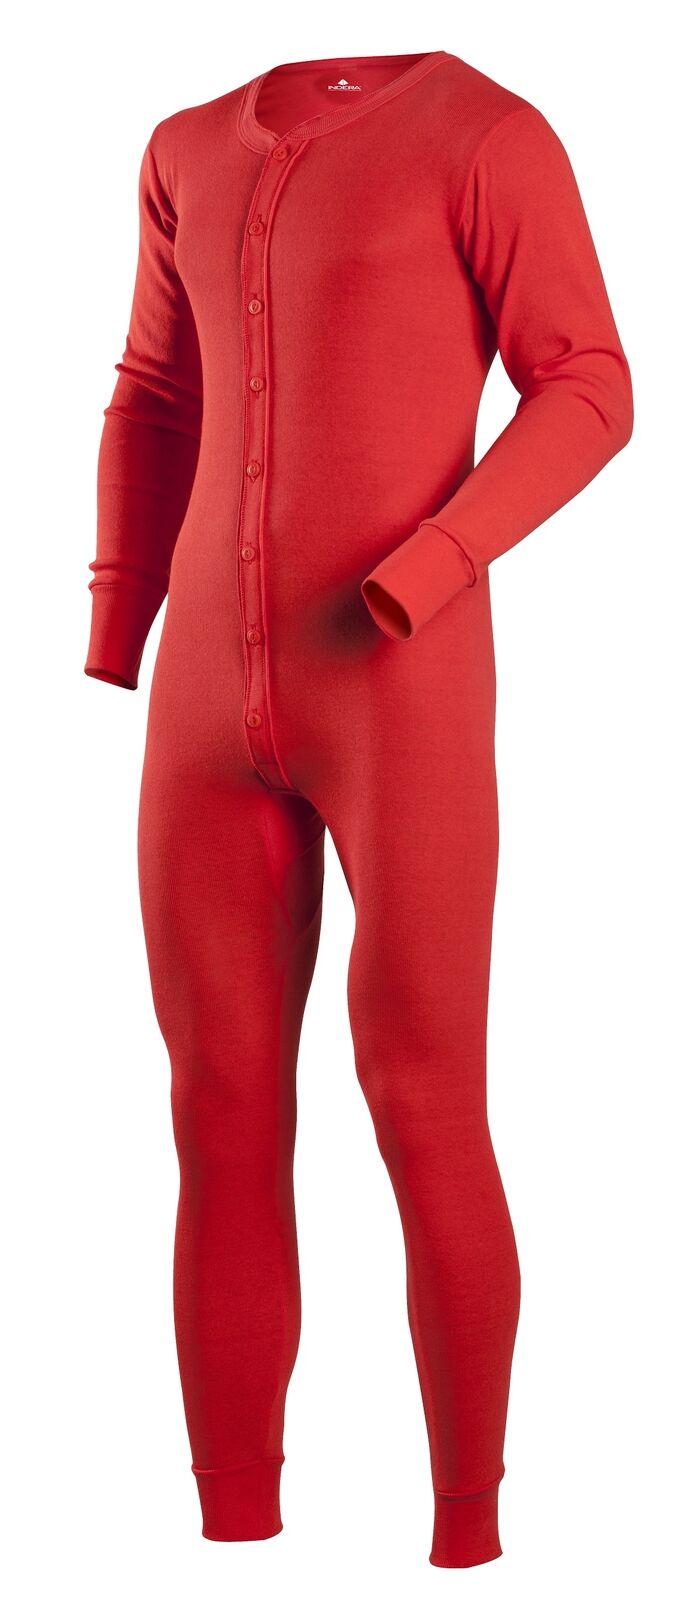 Indera Cotton 1 x 1 Rib Unionsuit - Red - Men Size XXL